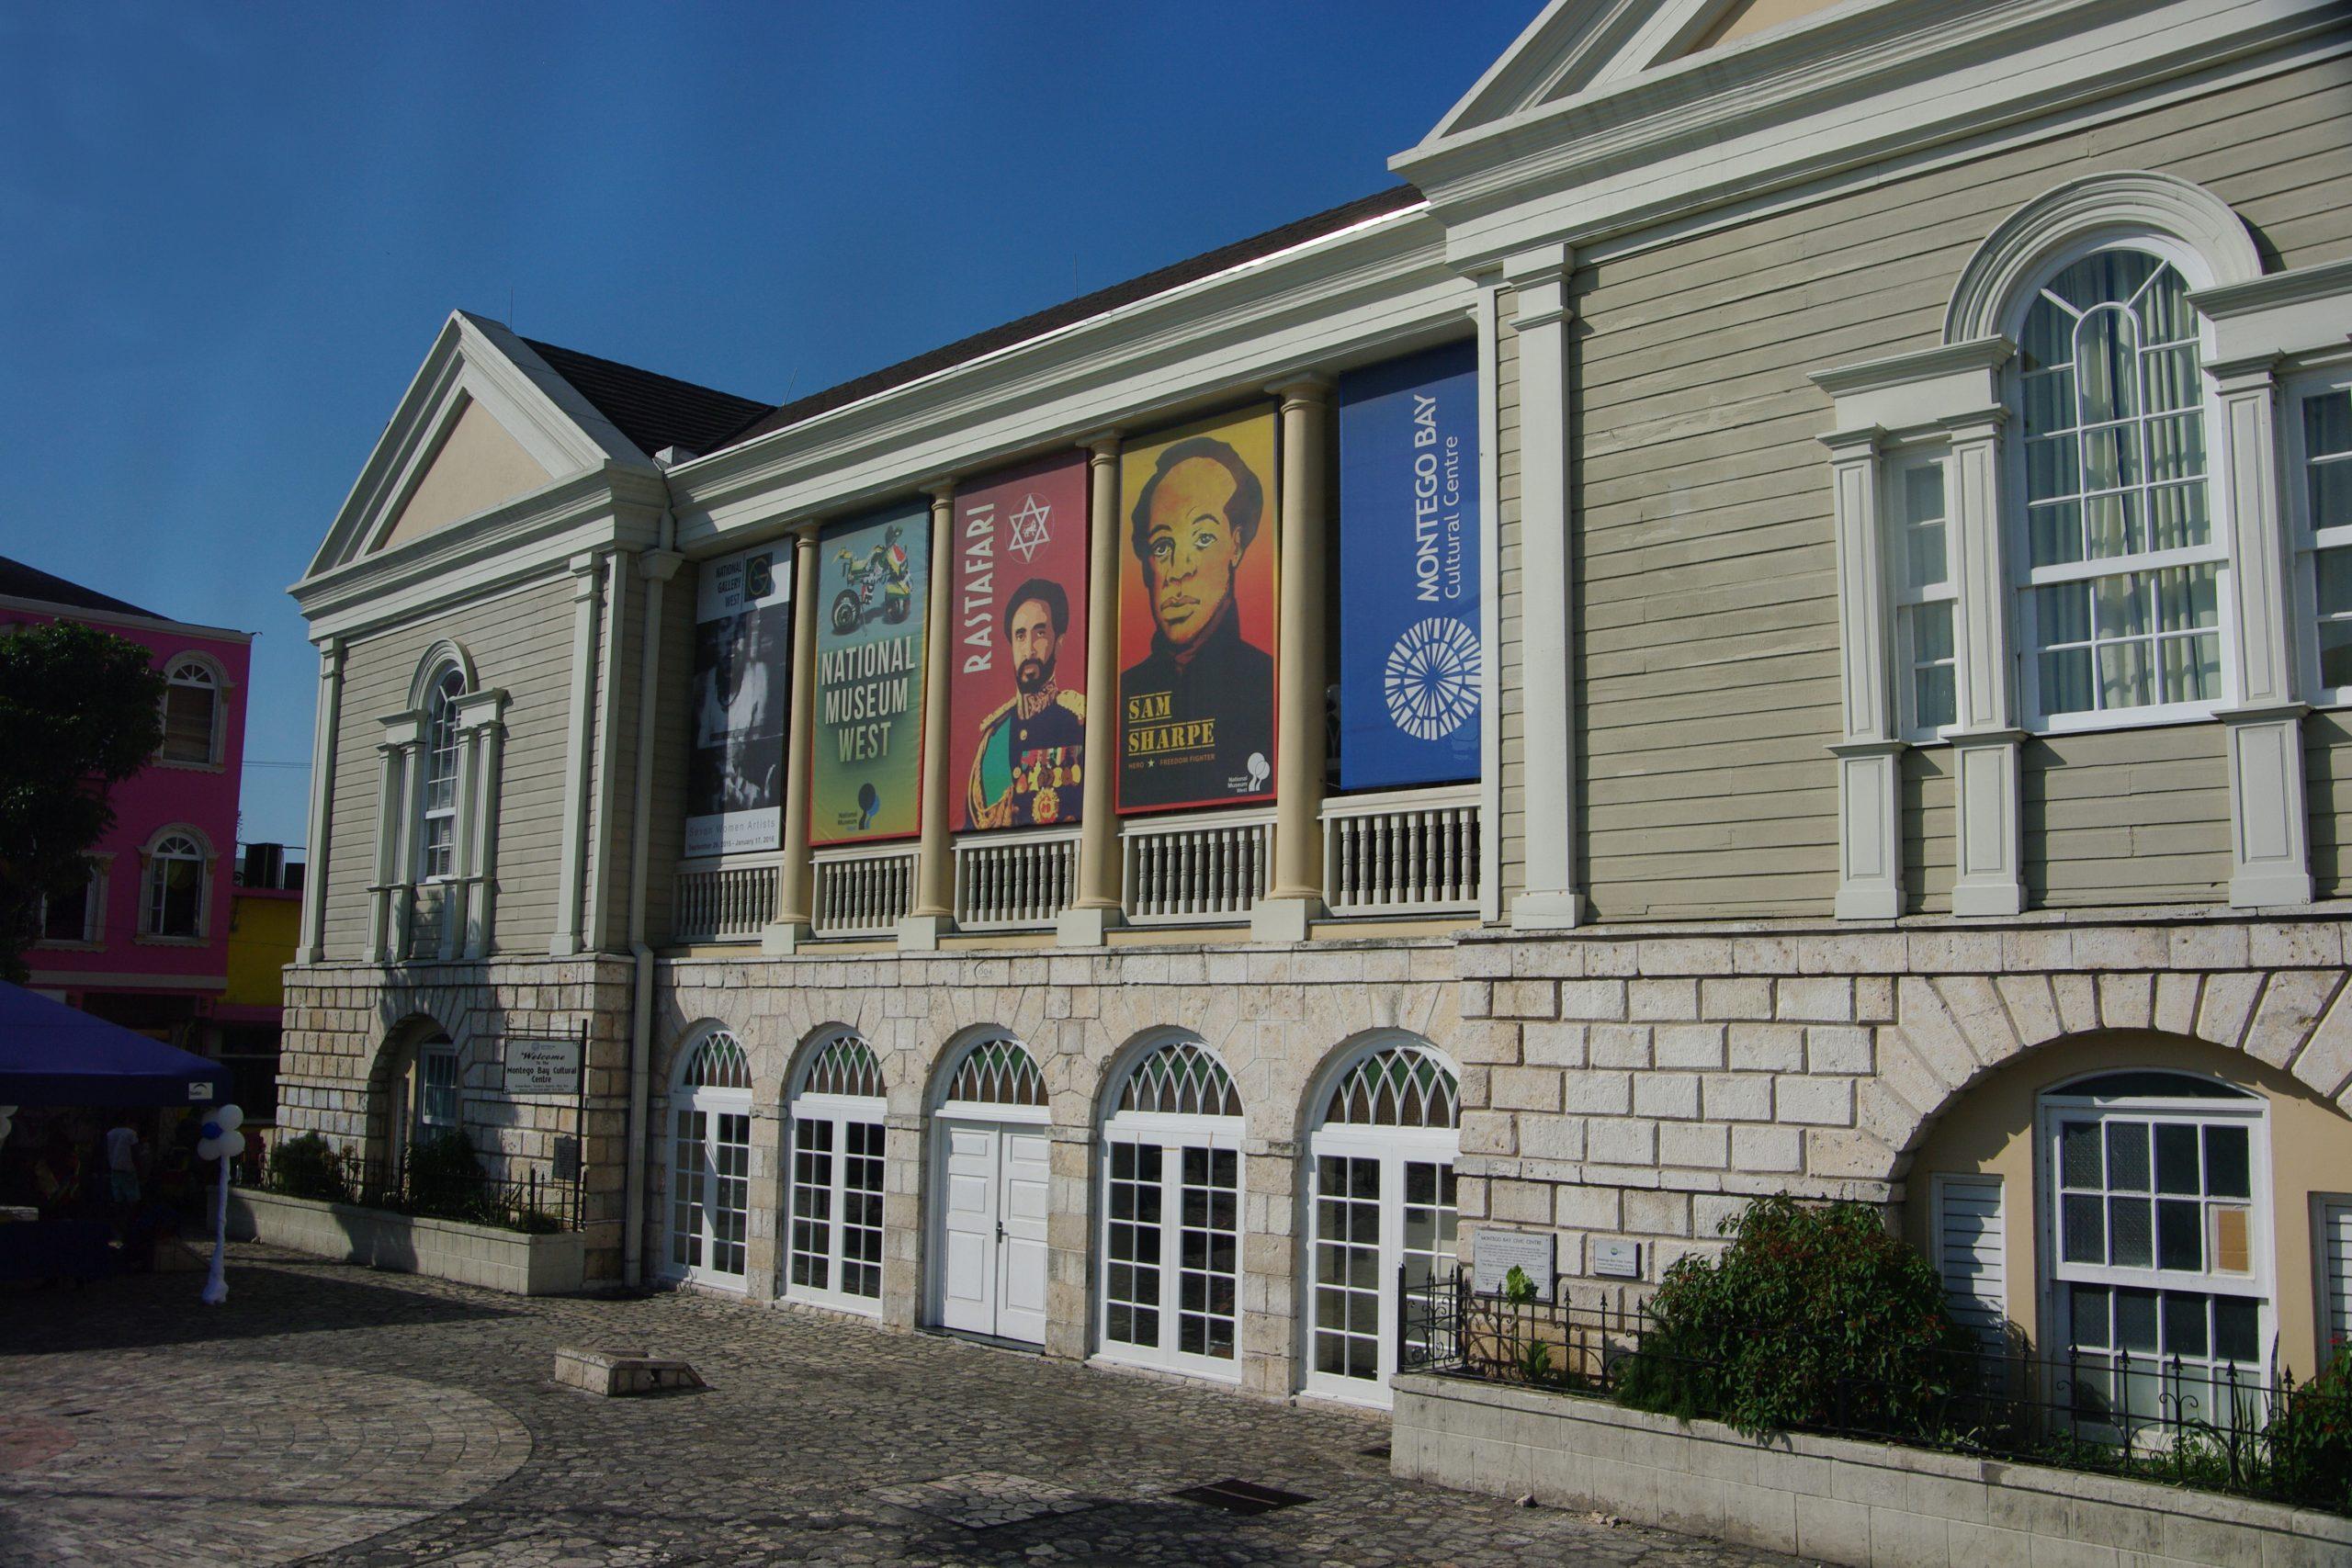 The Montego Bay Cultural Centre